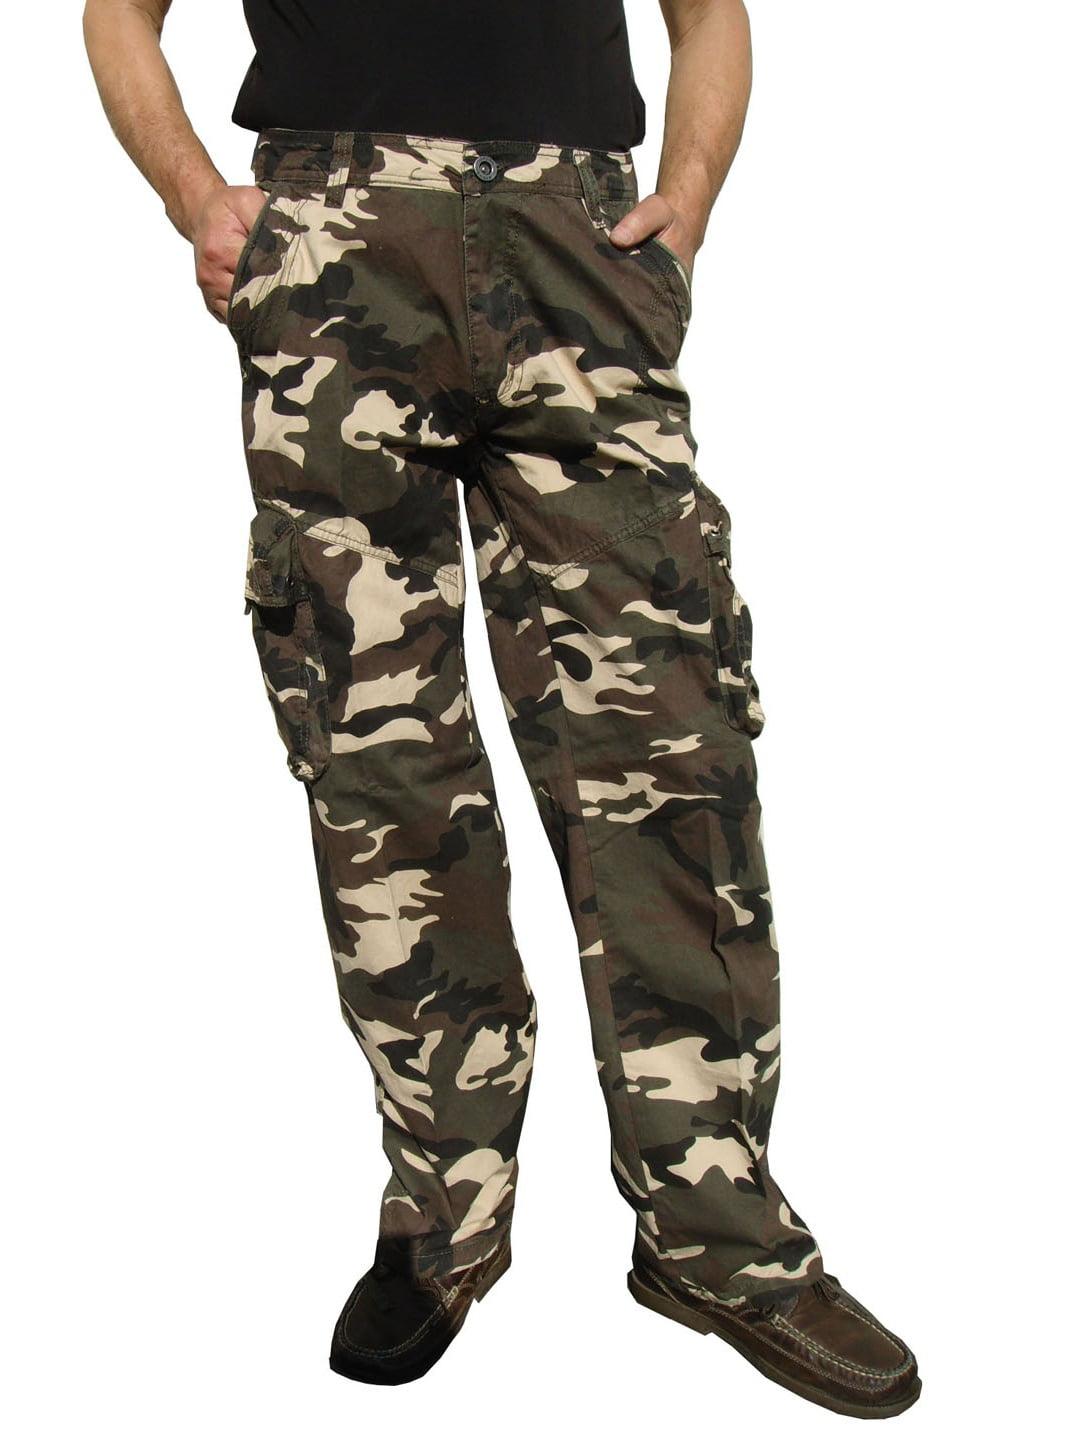 Mens Military-Style Camoflage Cargo Pants #27C3 34x34_DE